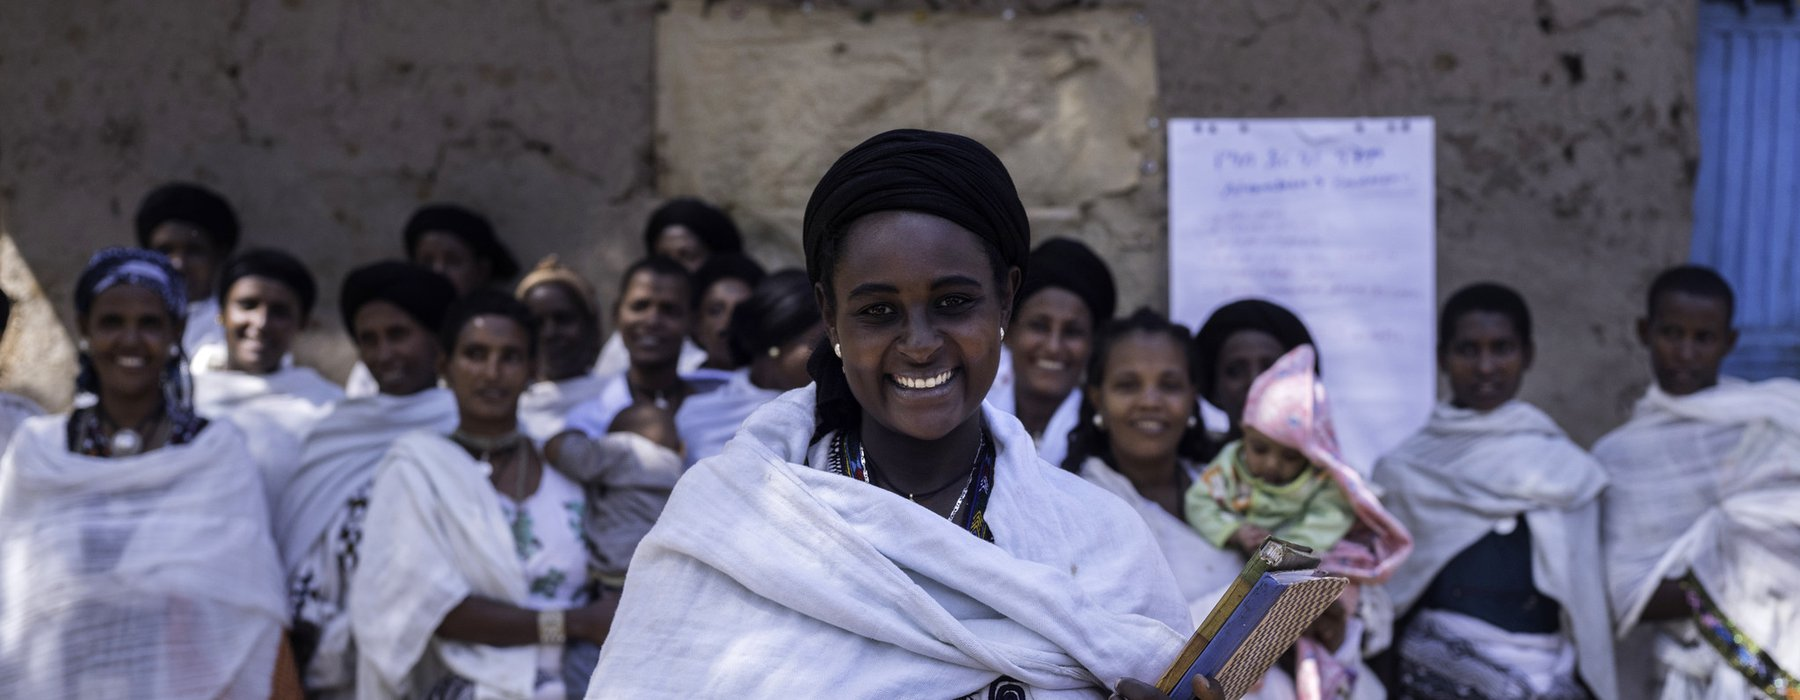 Addise is beekeeping in Ethiopia